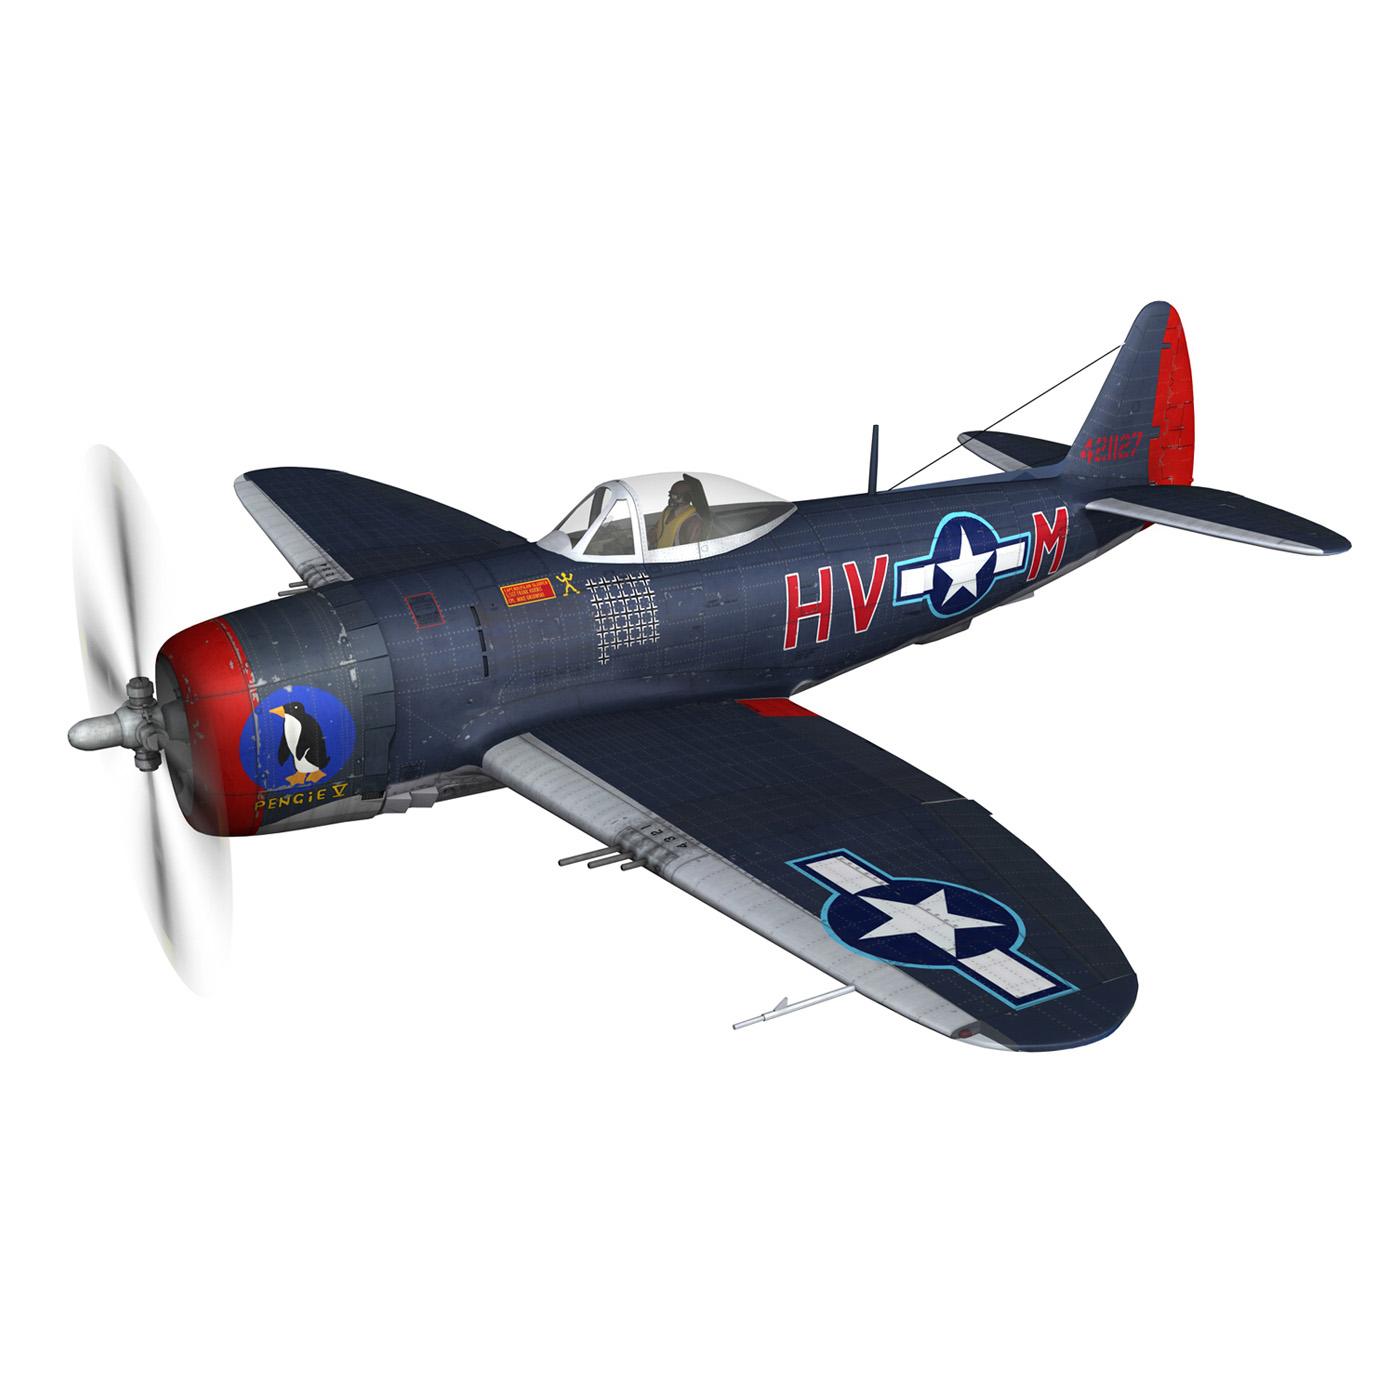 republic p-47m thunderbolt – pengie v 3d model 3ds c4d fbx lwo lw lws obj 279716